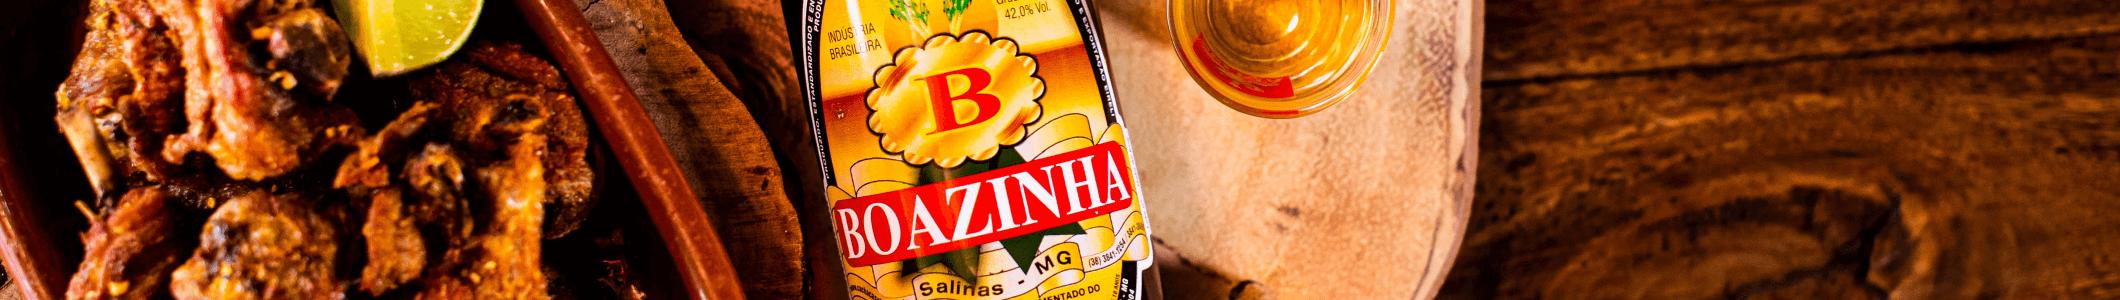 Banner Tarja Boazinha Categoria